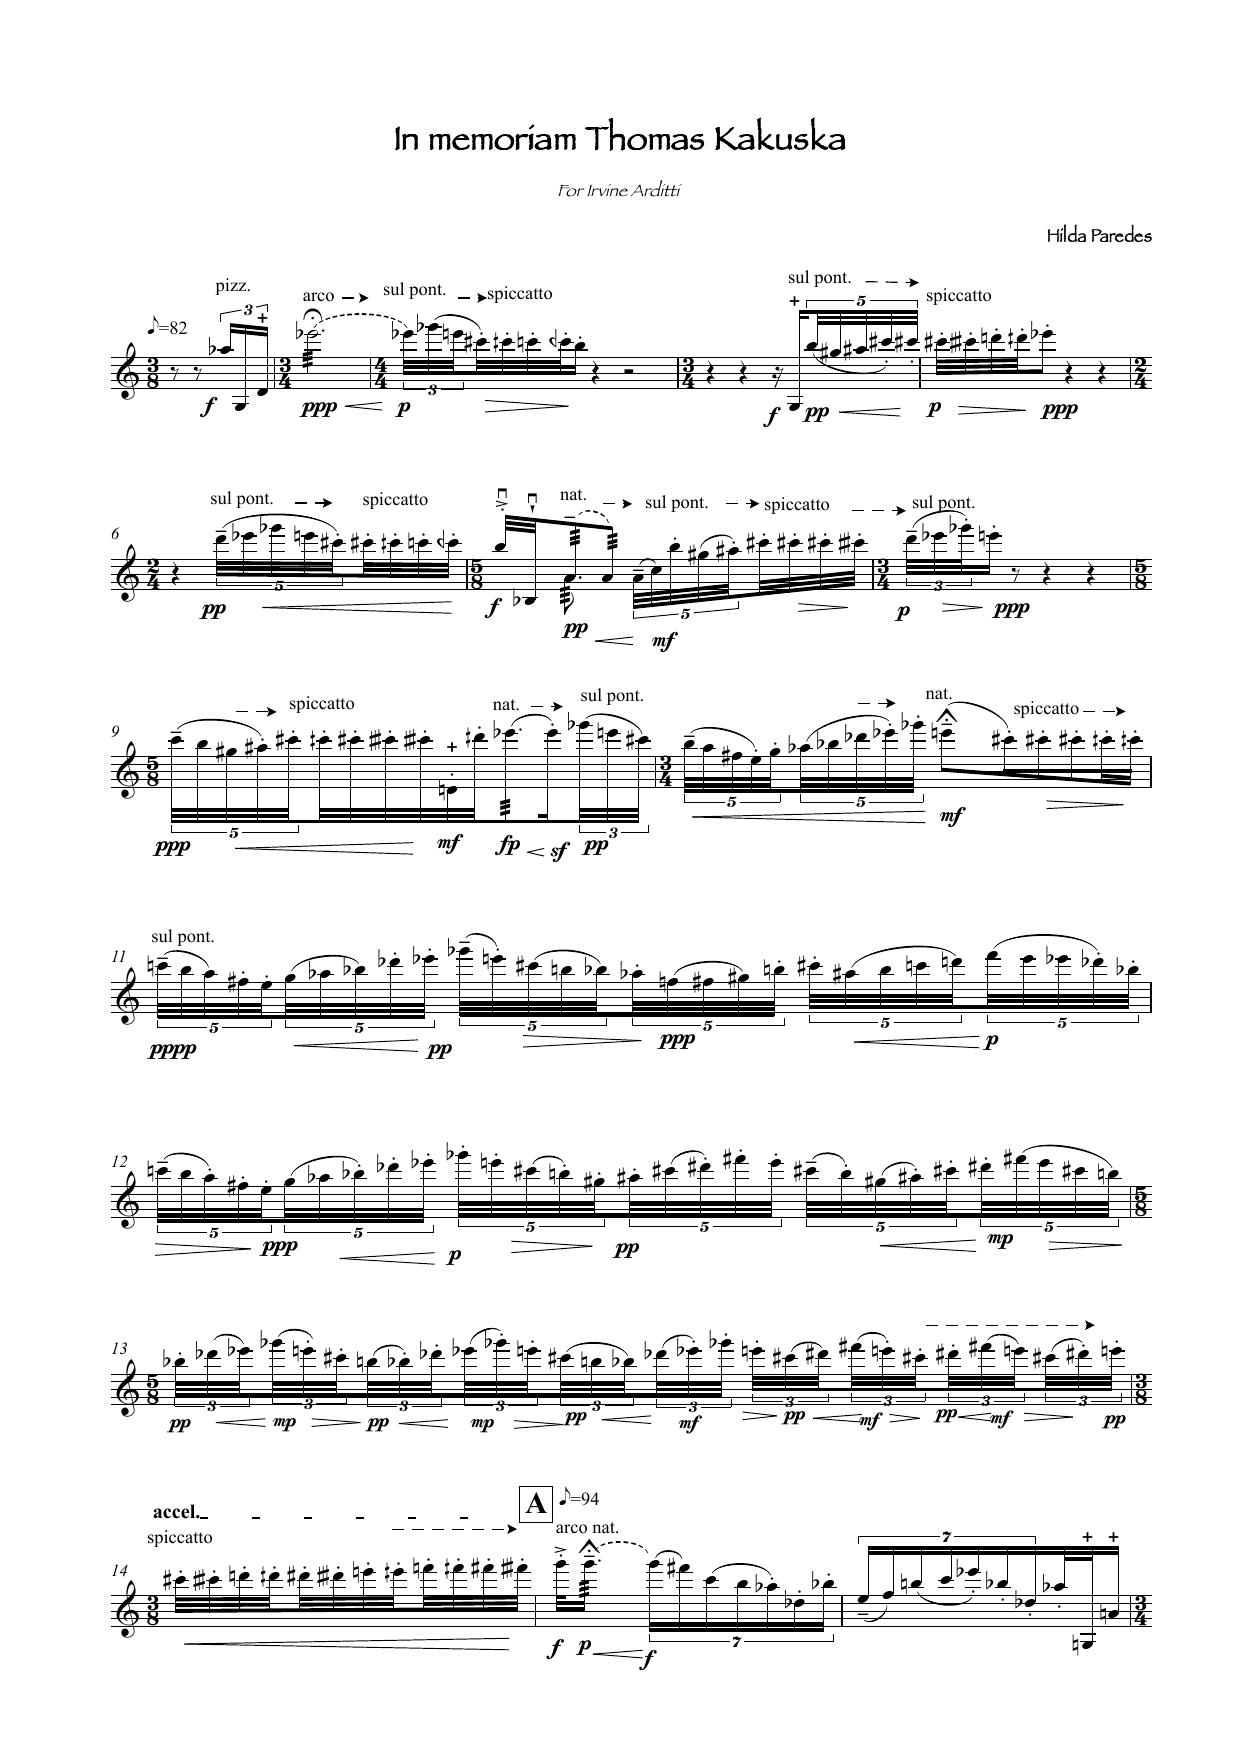 In Memoriam Thomas Kakuska Sheet Music